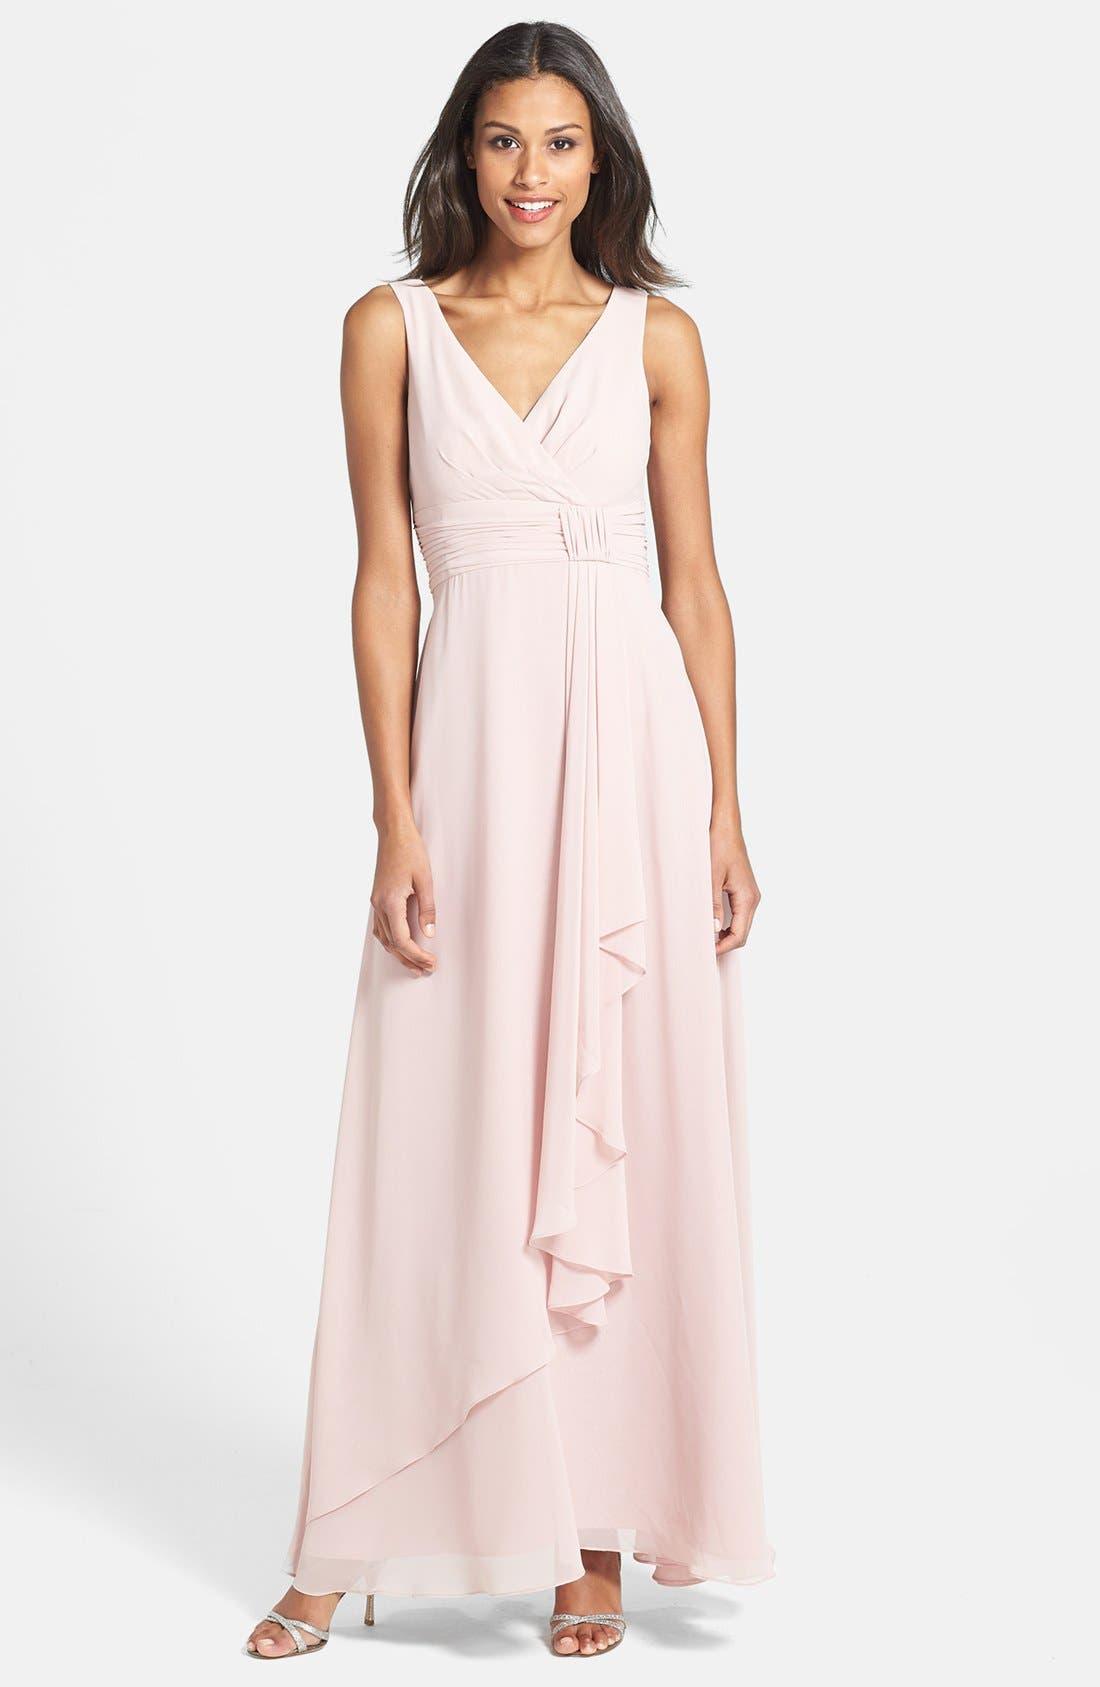 Alternate Image 1 Selected - Eliza J Front Drape Chiffon Dress